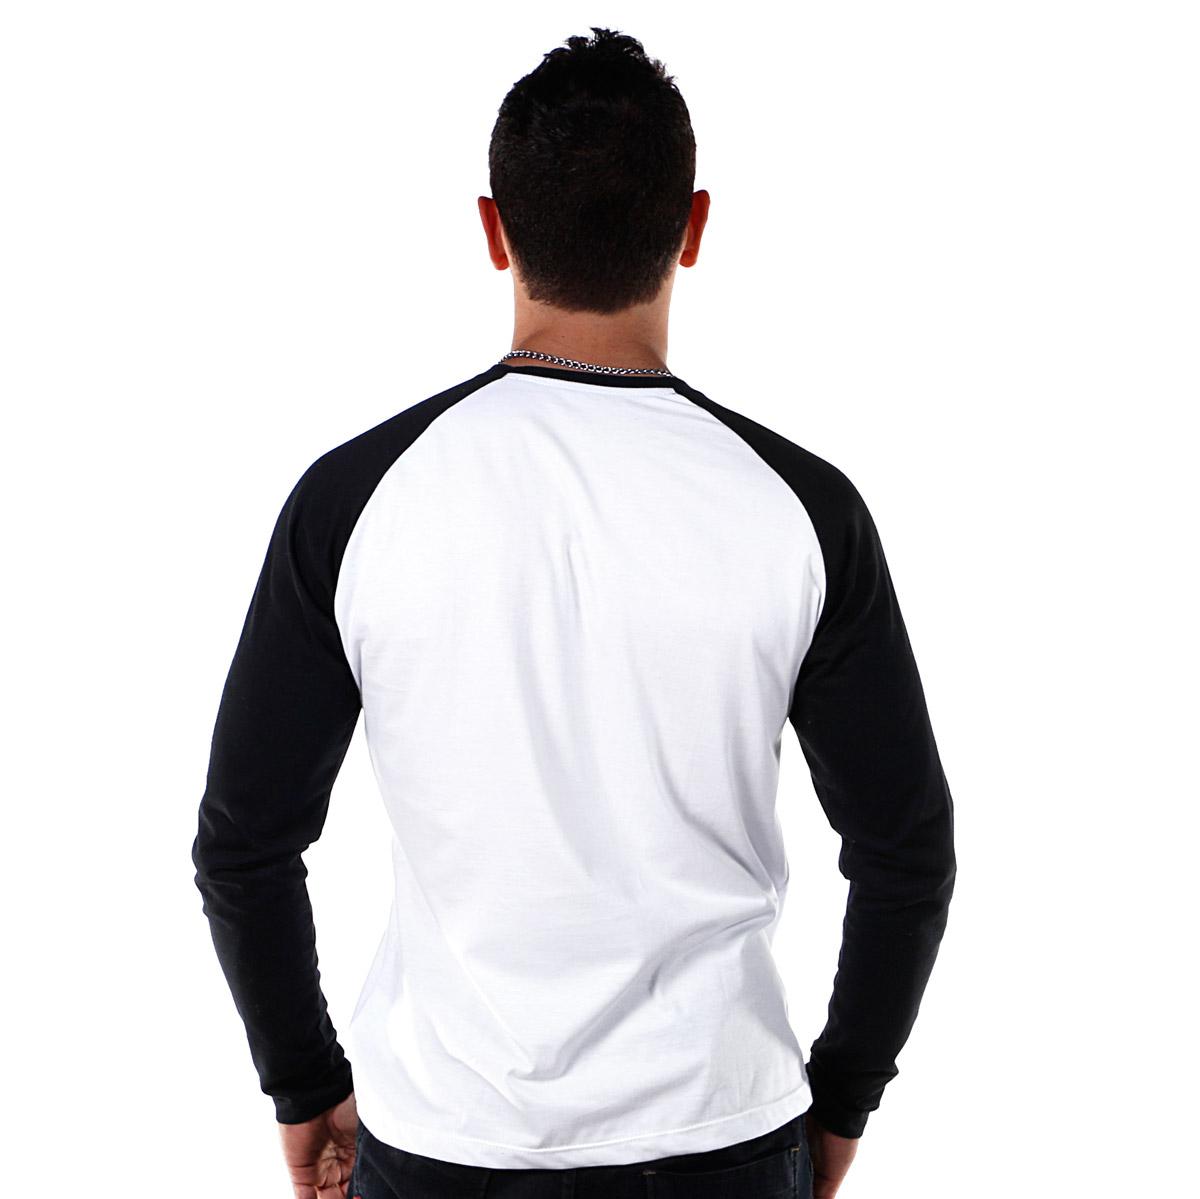 Camiseta Manga Longa Raglan Masculina Ivete Sangalo Piscadela